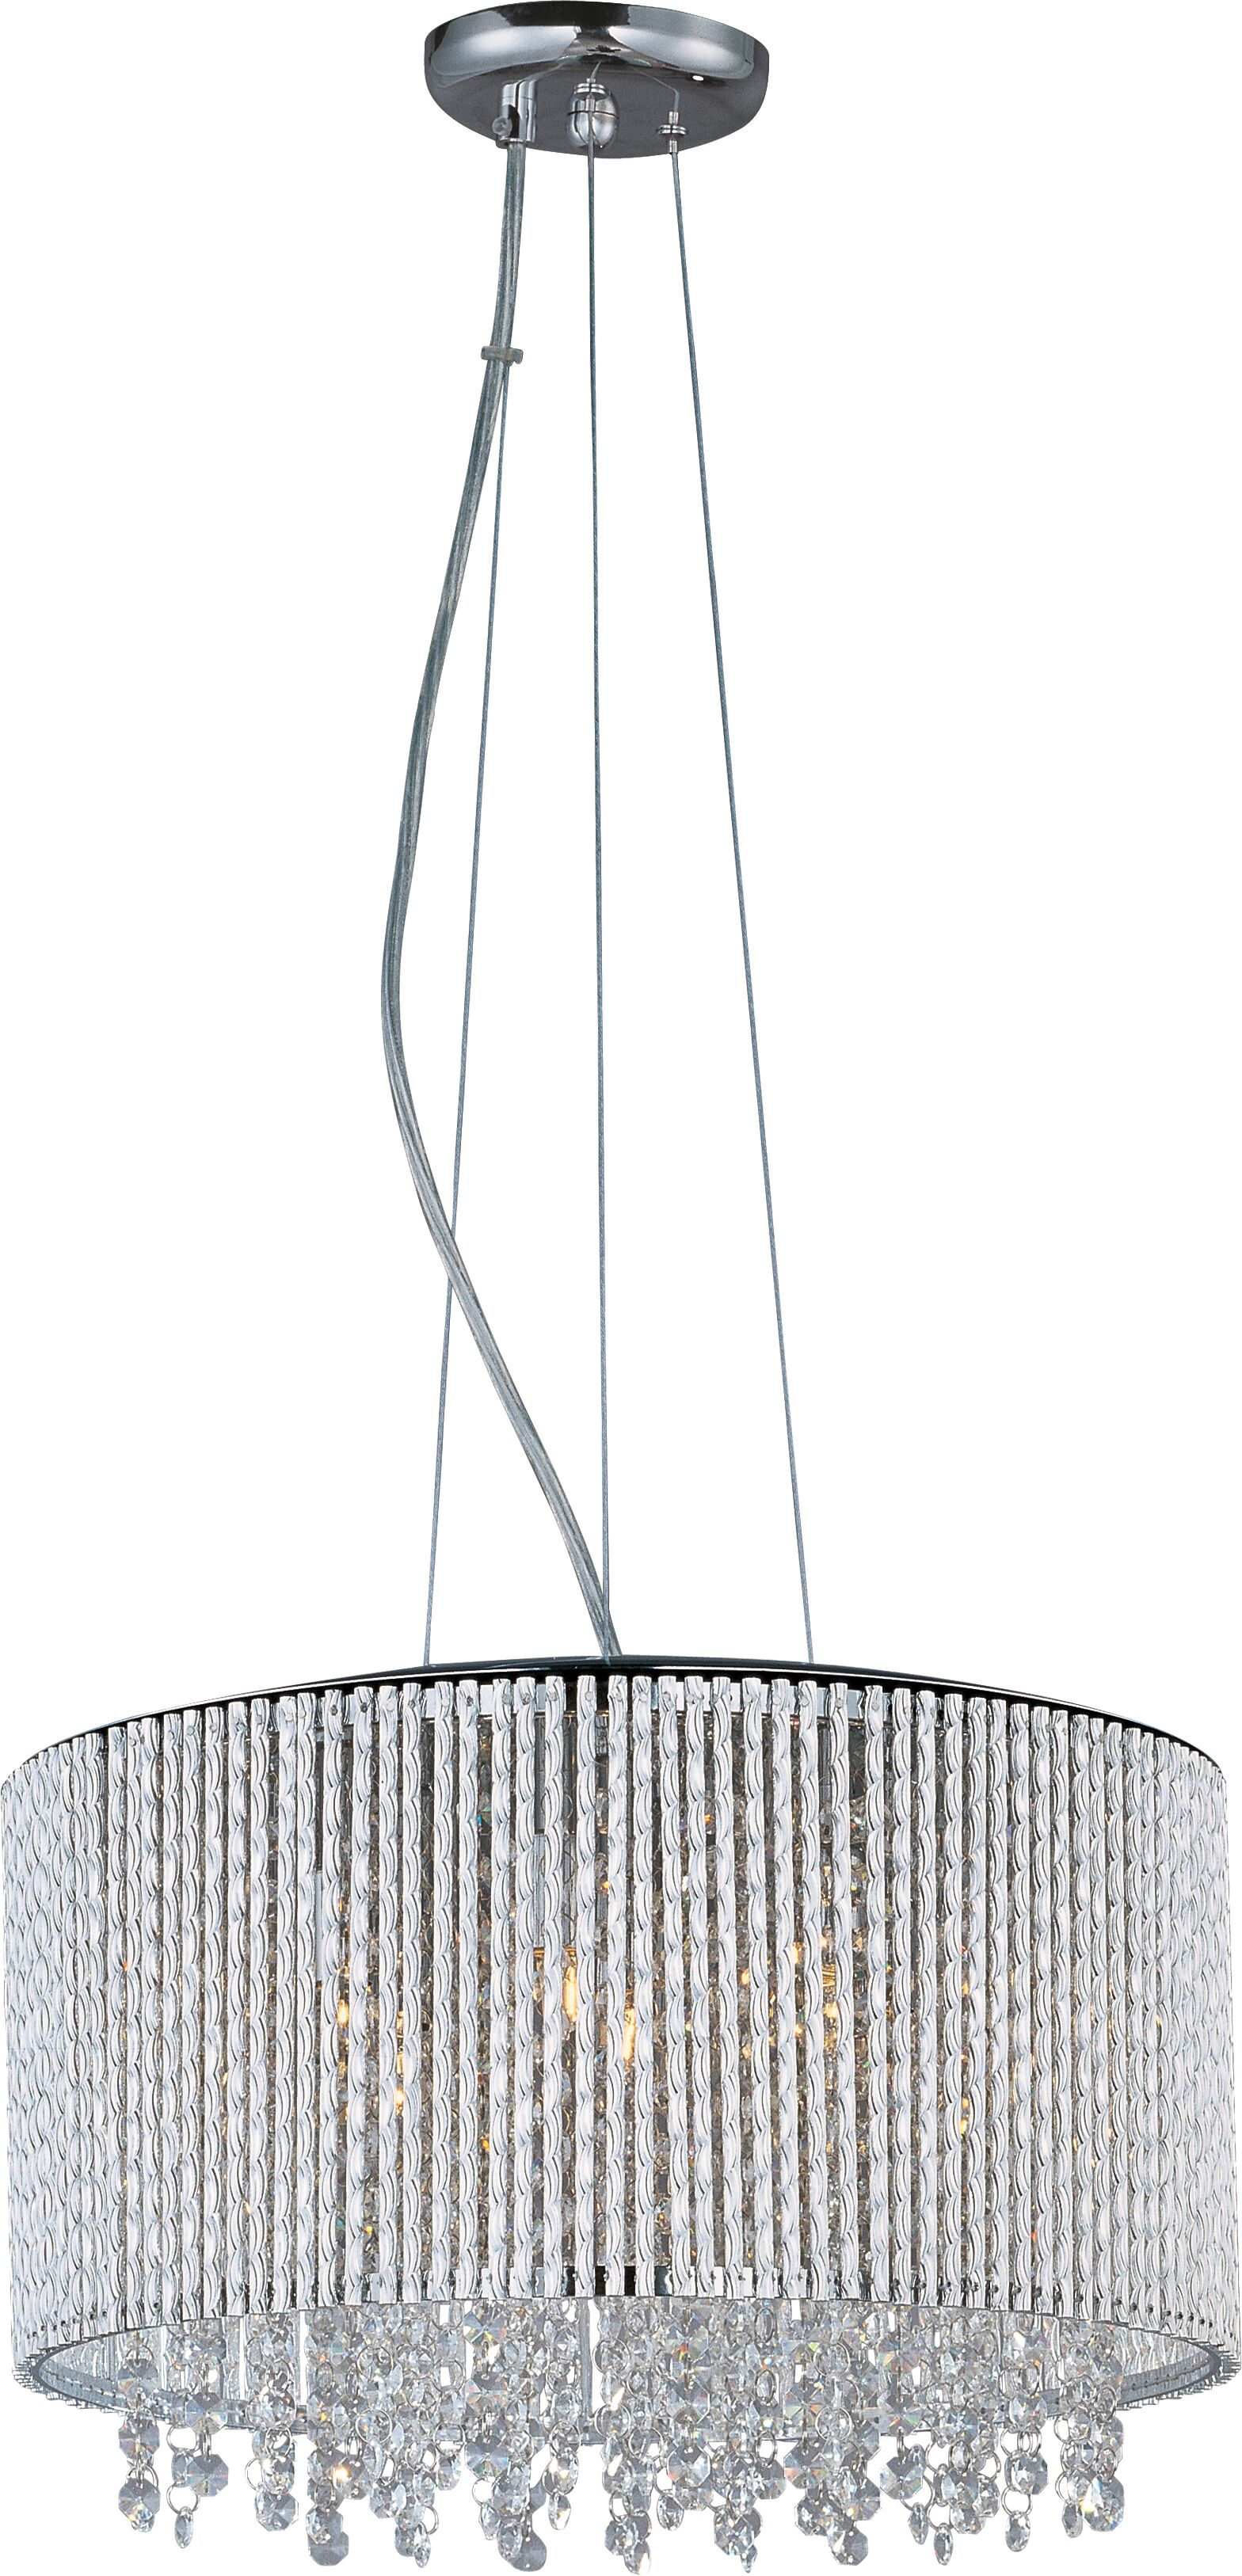 Benziger 7-Light Crystal Chandelier